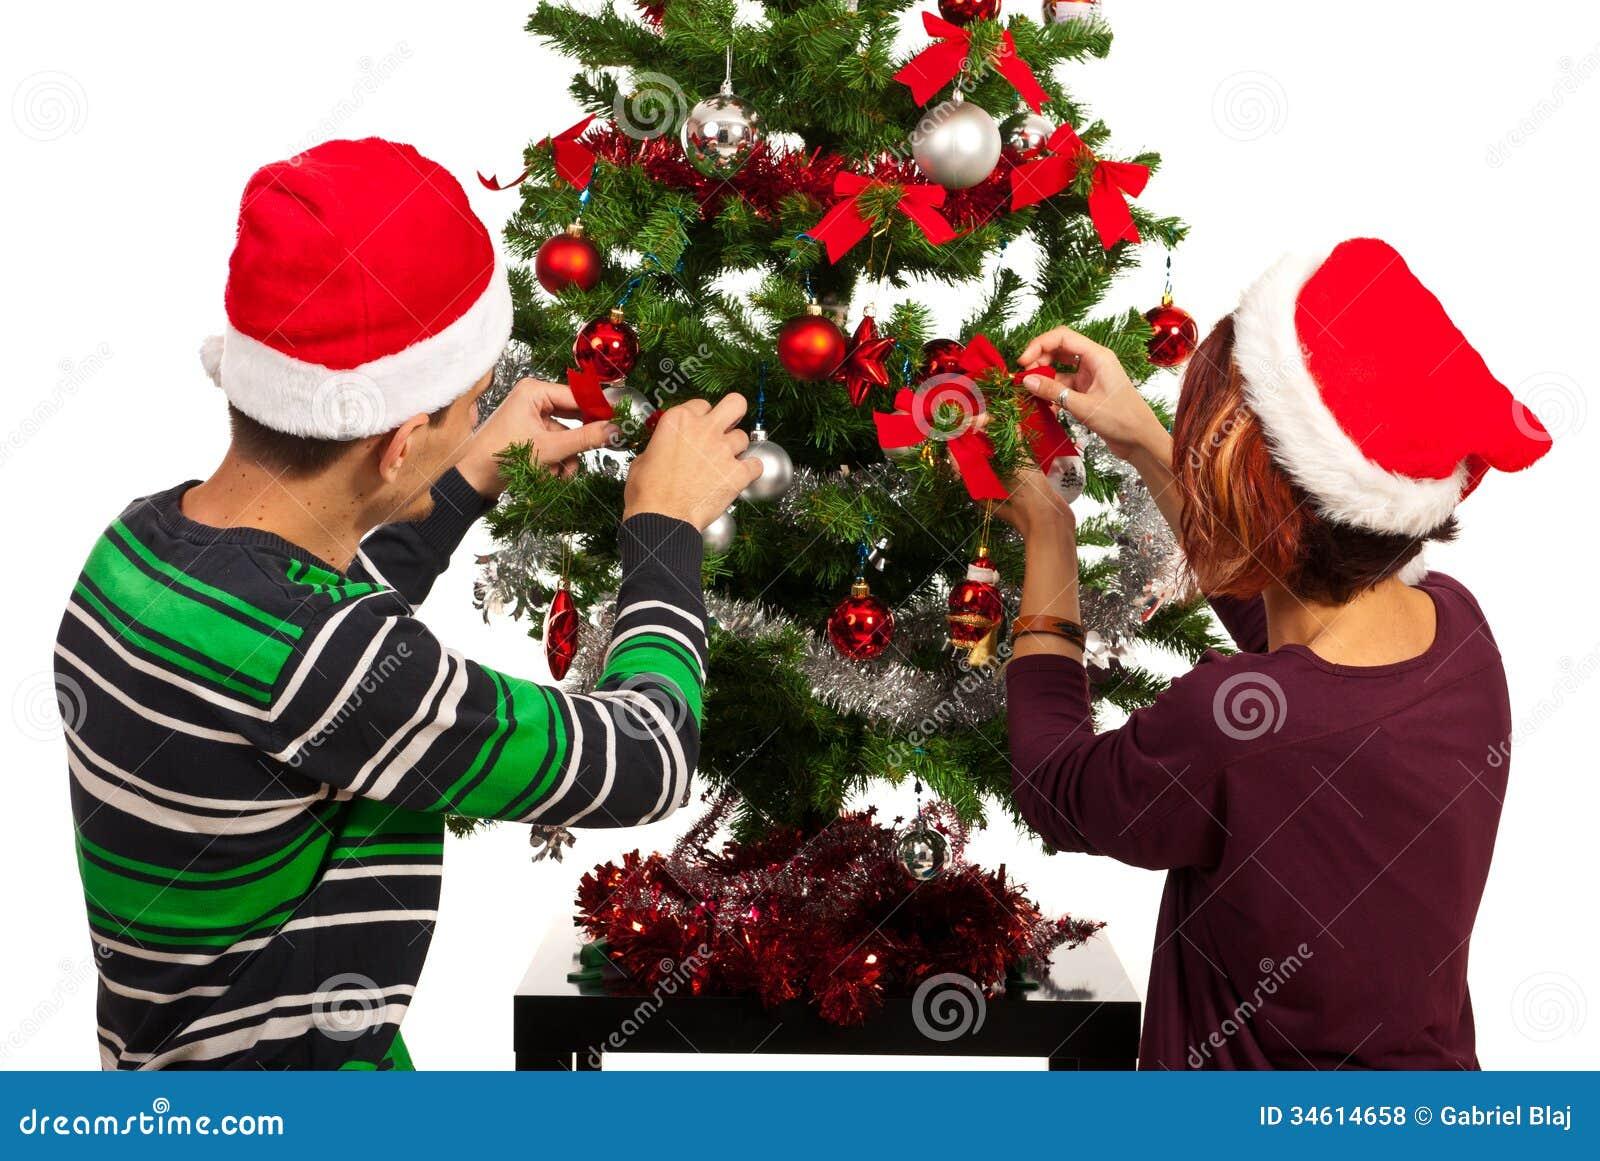 Couple Decorate Christmas Tree Stock Photo Image 34614658